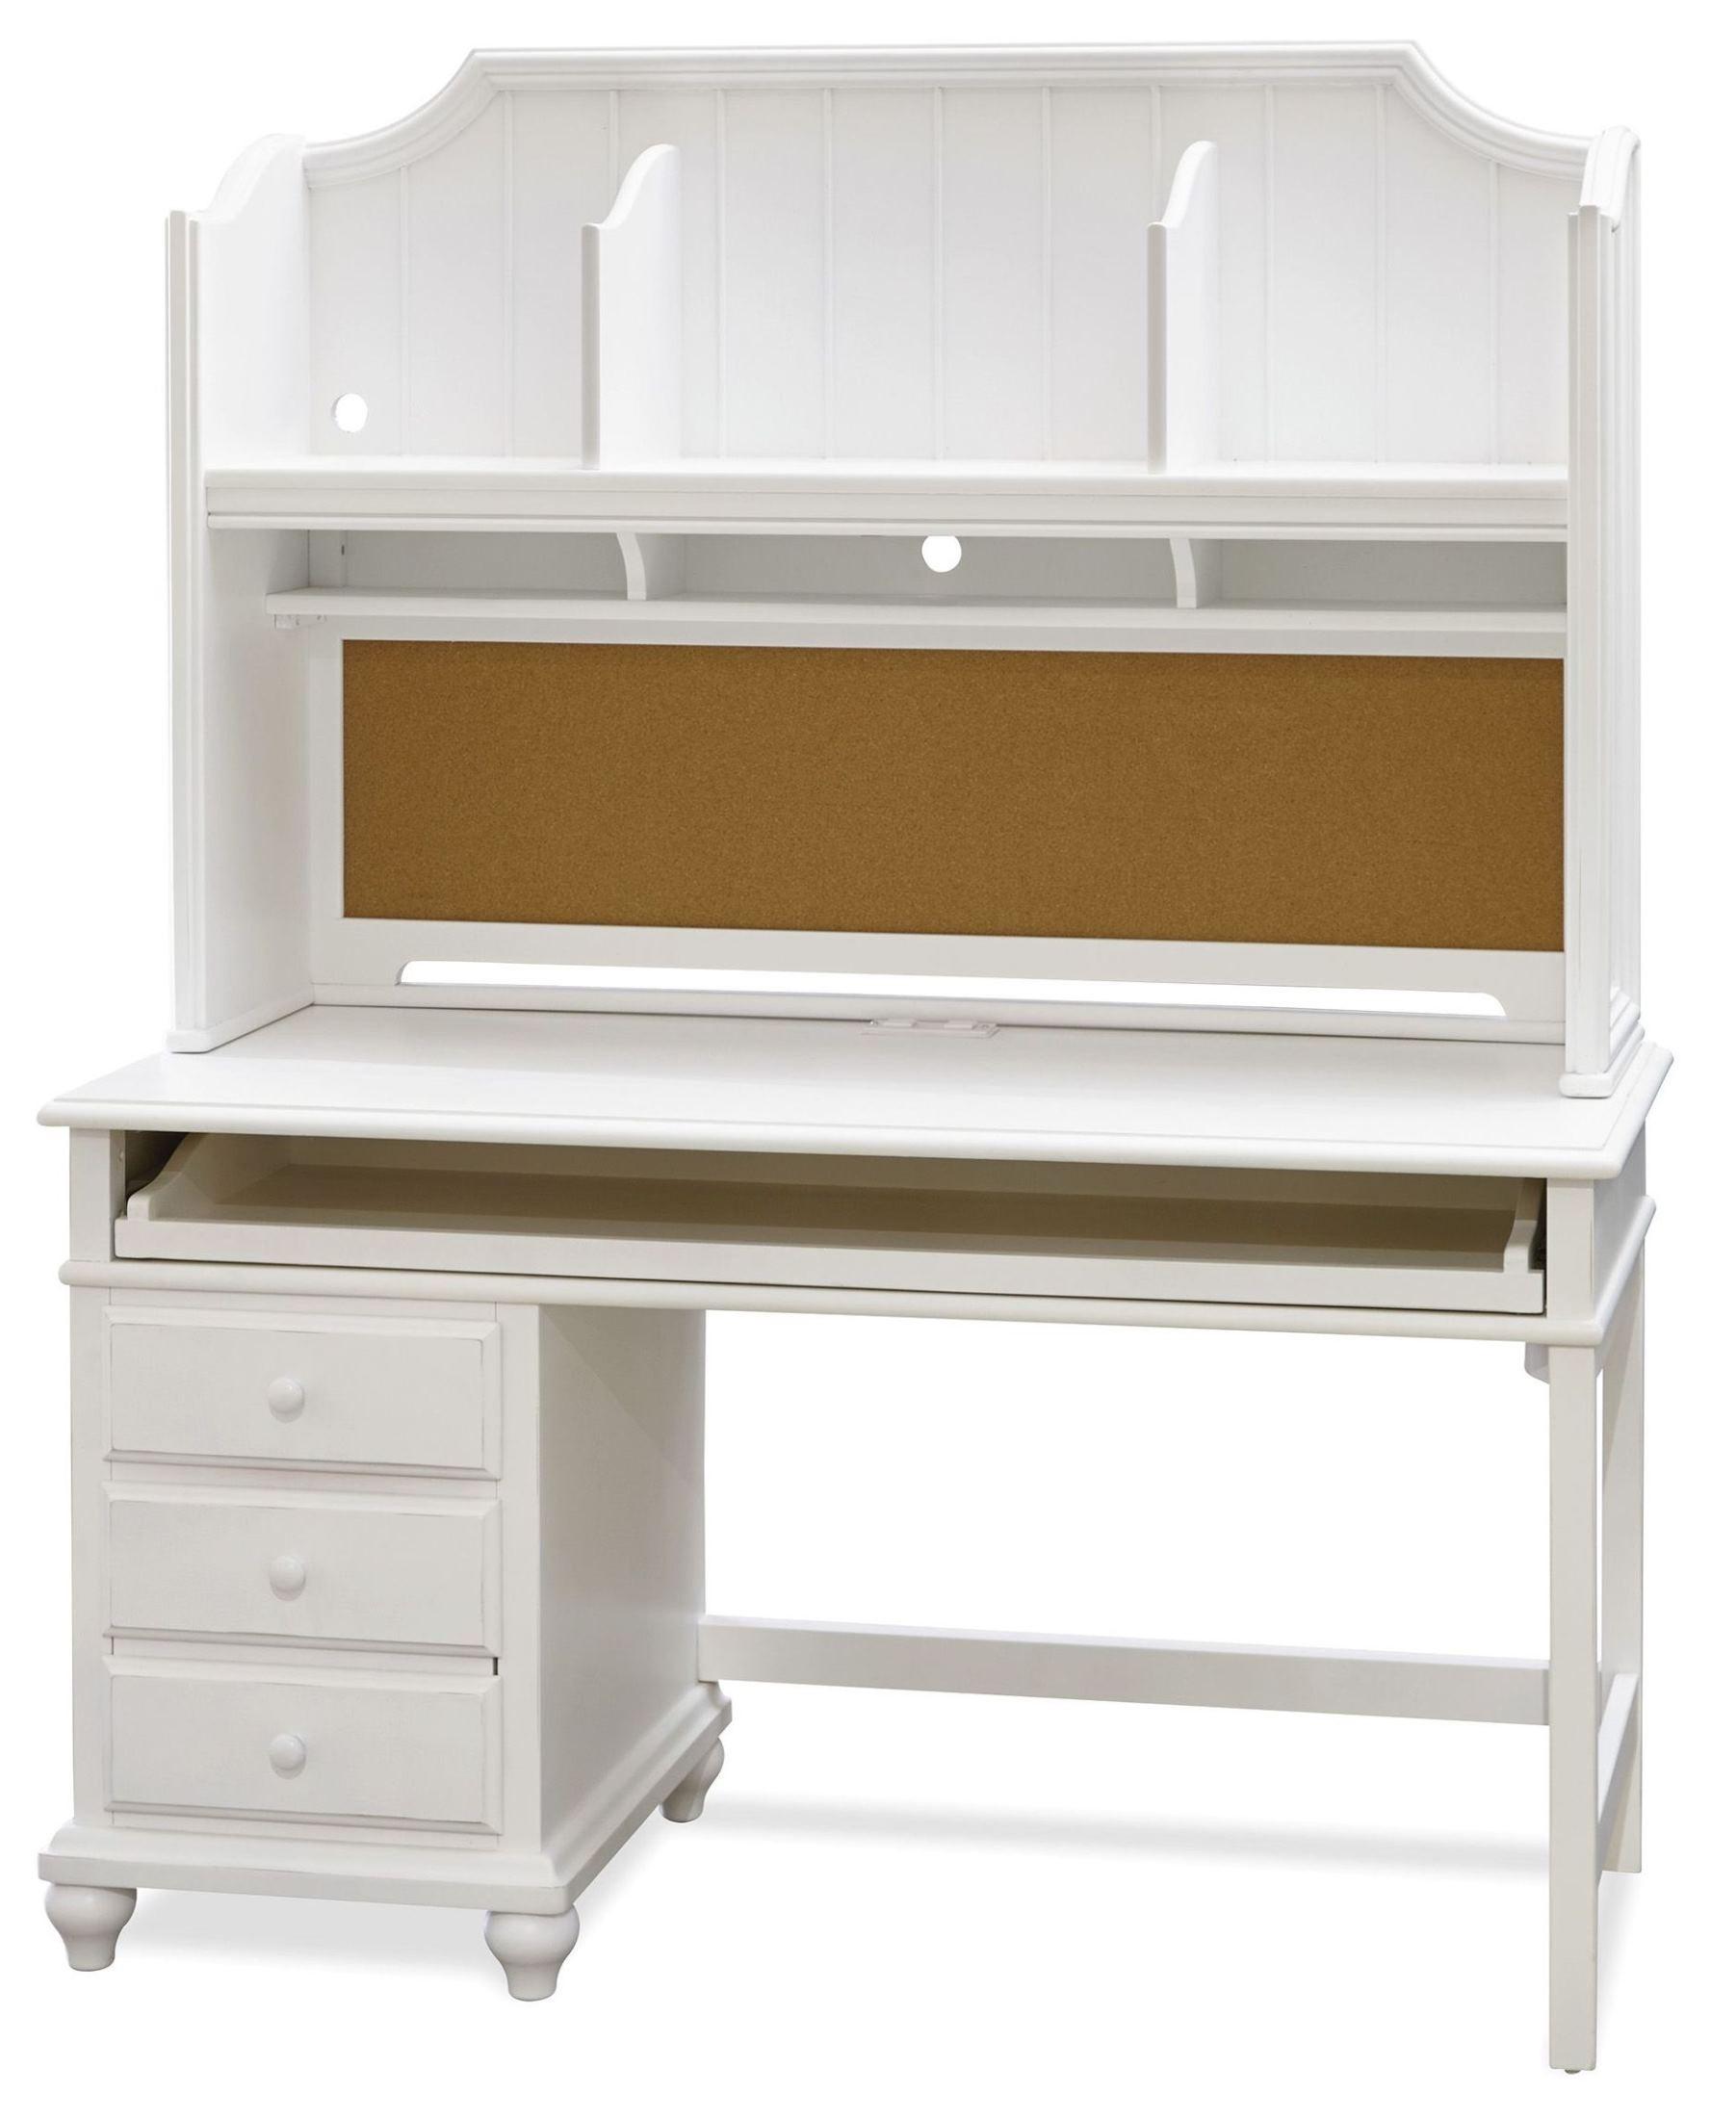 smartstuff white desk with hutch from smart stuff 437a020 437a027 coleman furniture. Black Bedroom Furniture Sets. Home Design Ideas